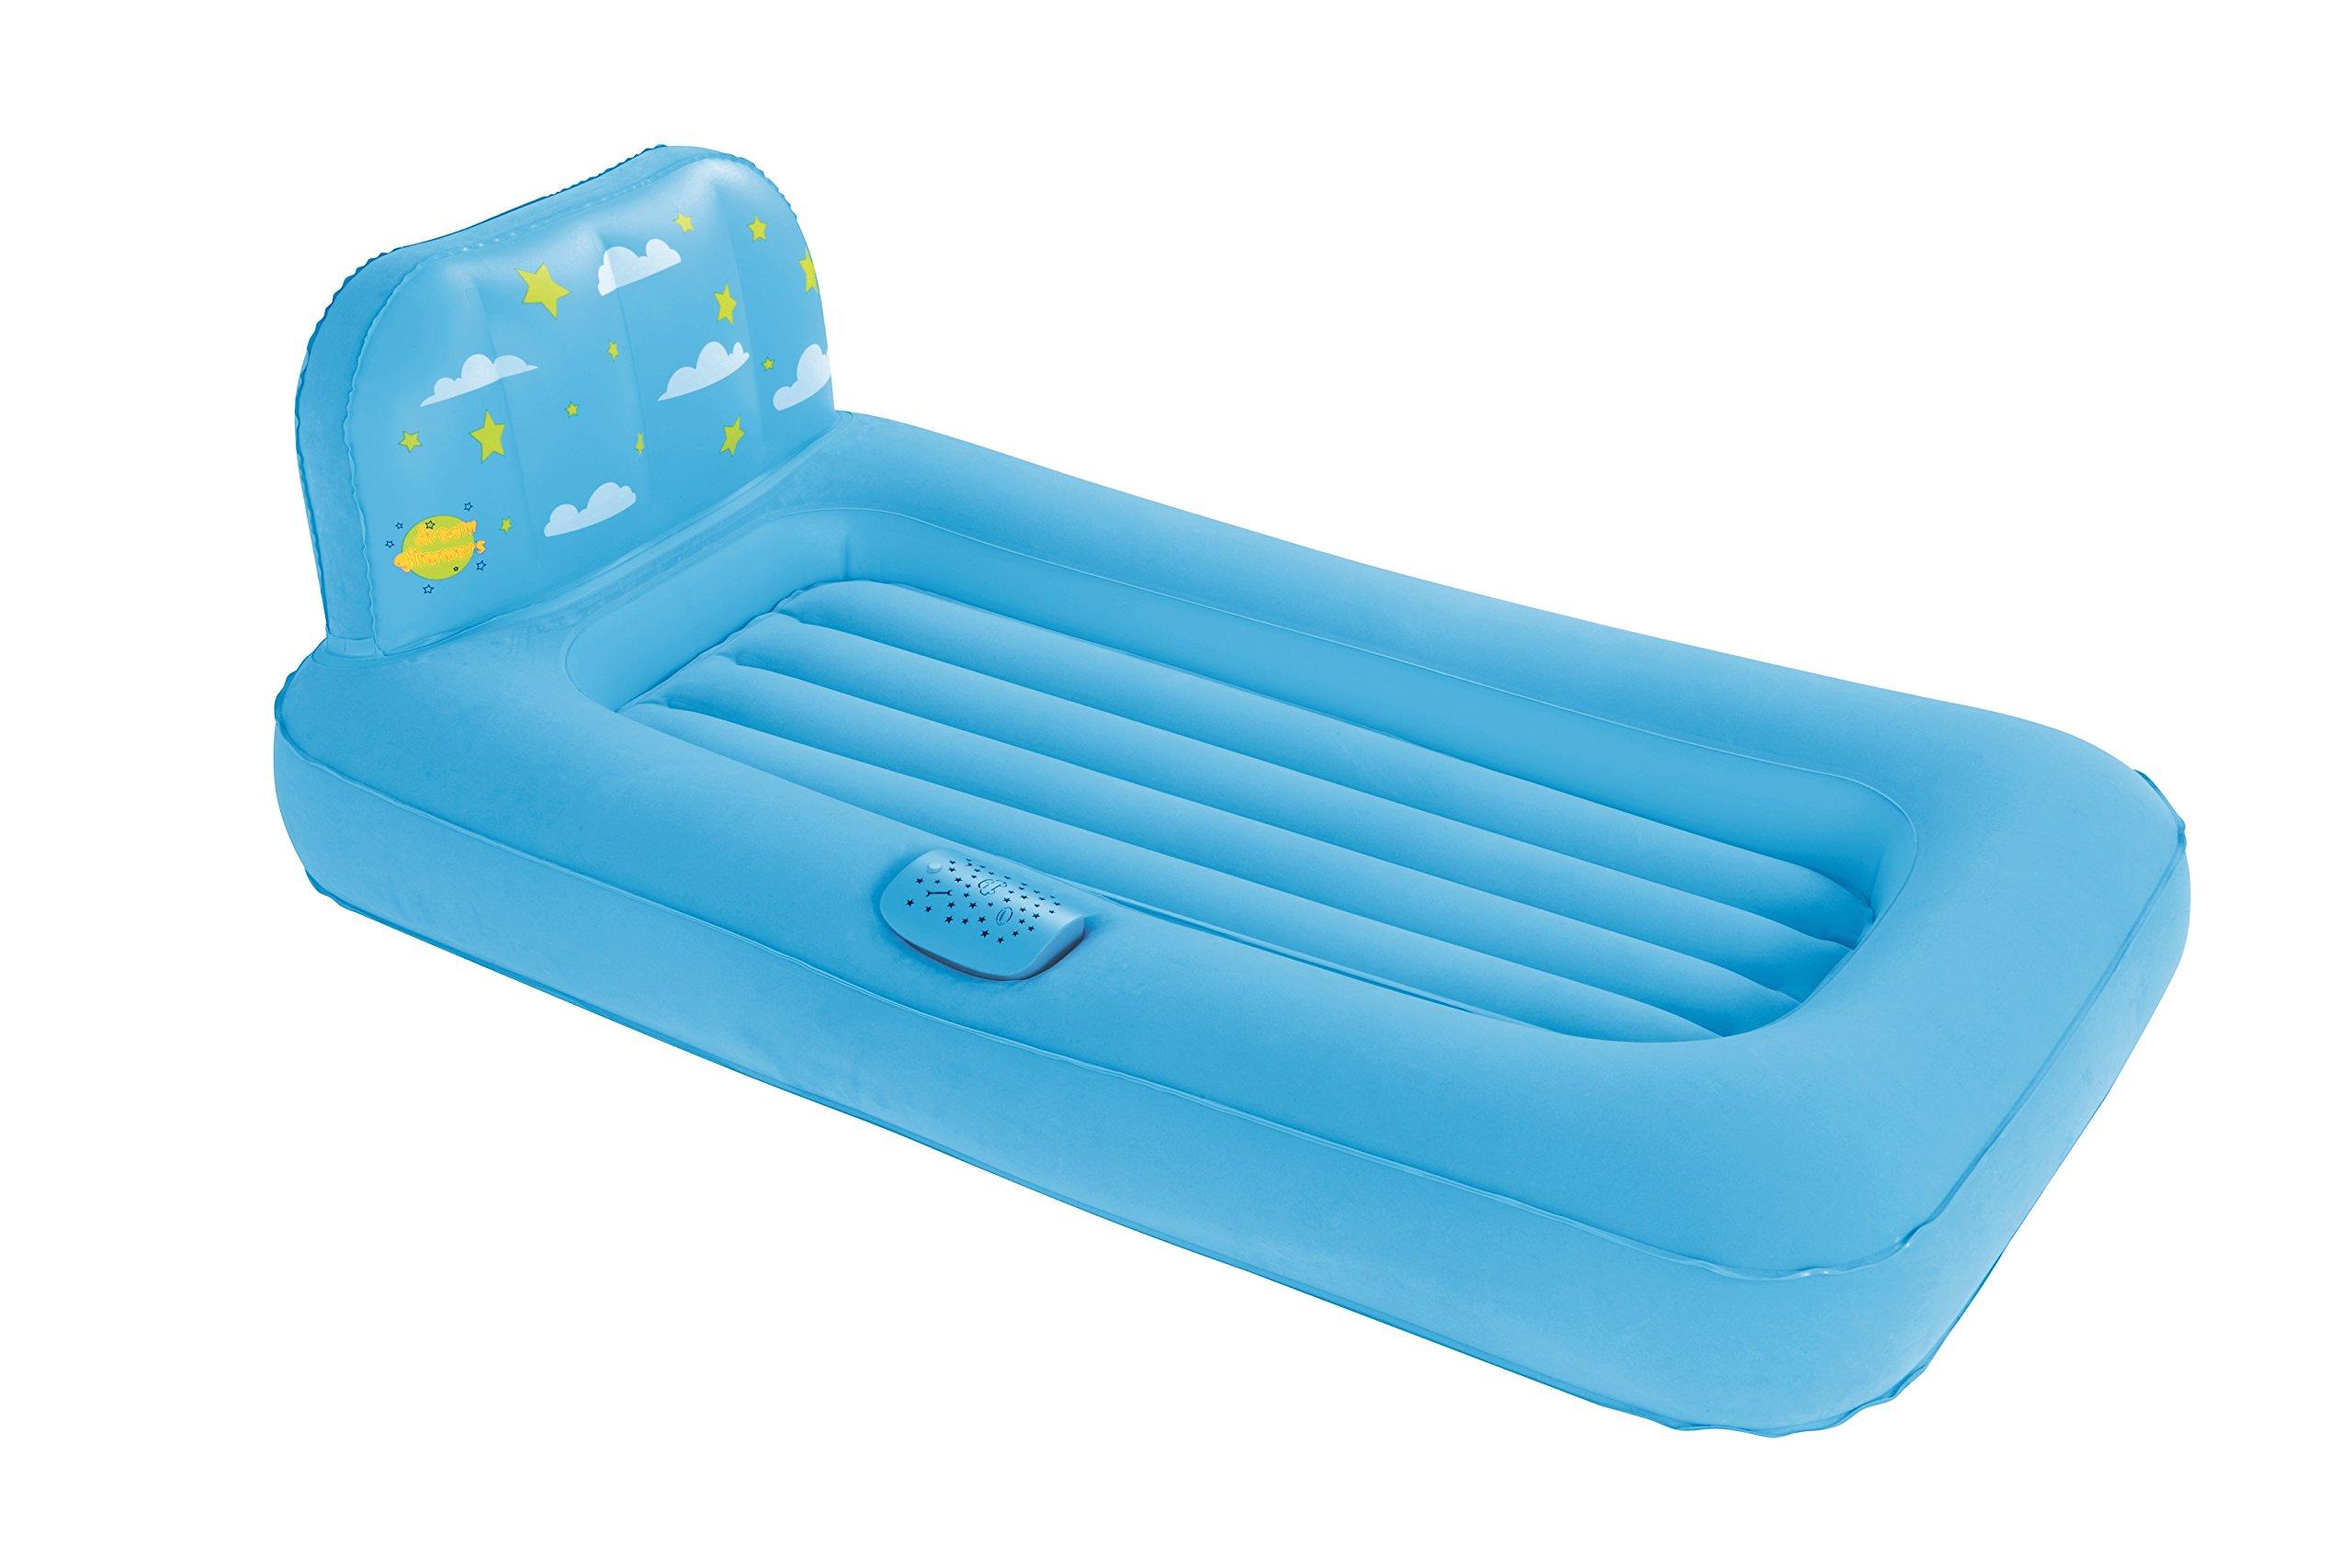 Bestway Dream Glimmers Airbed - Blue